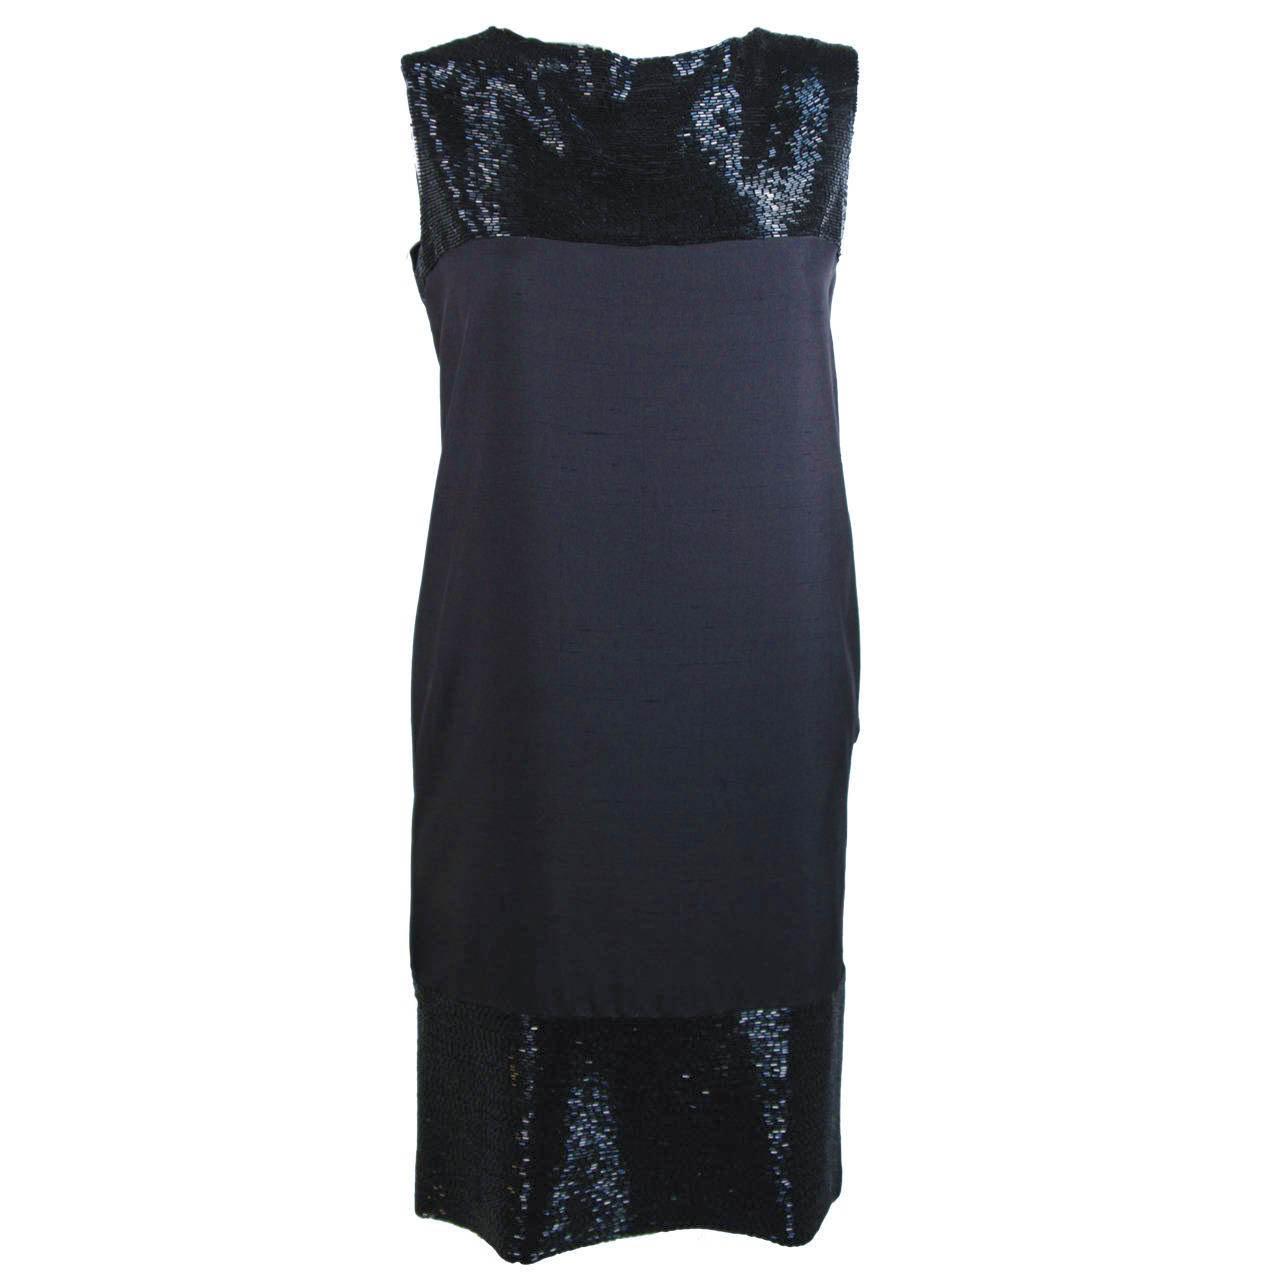 ELIZABETH MASON COUTURE Silk Beaded Cocktail Dress